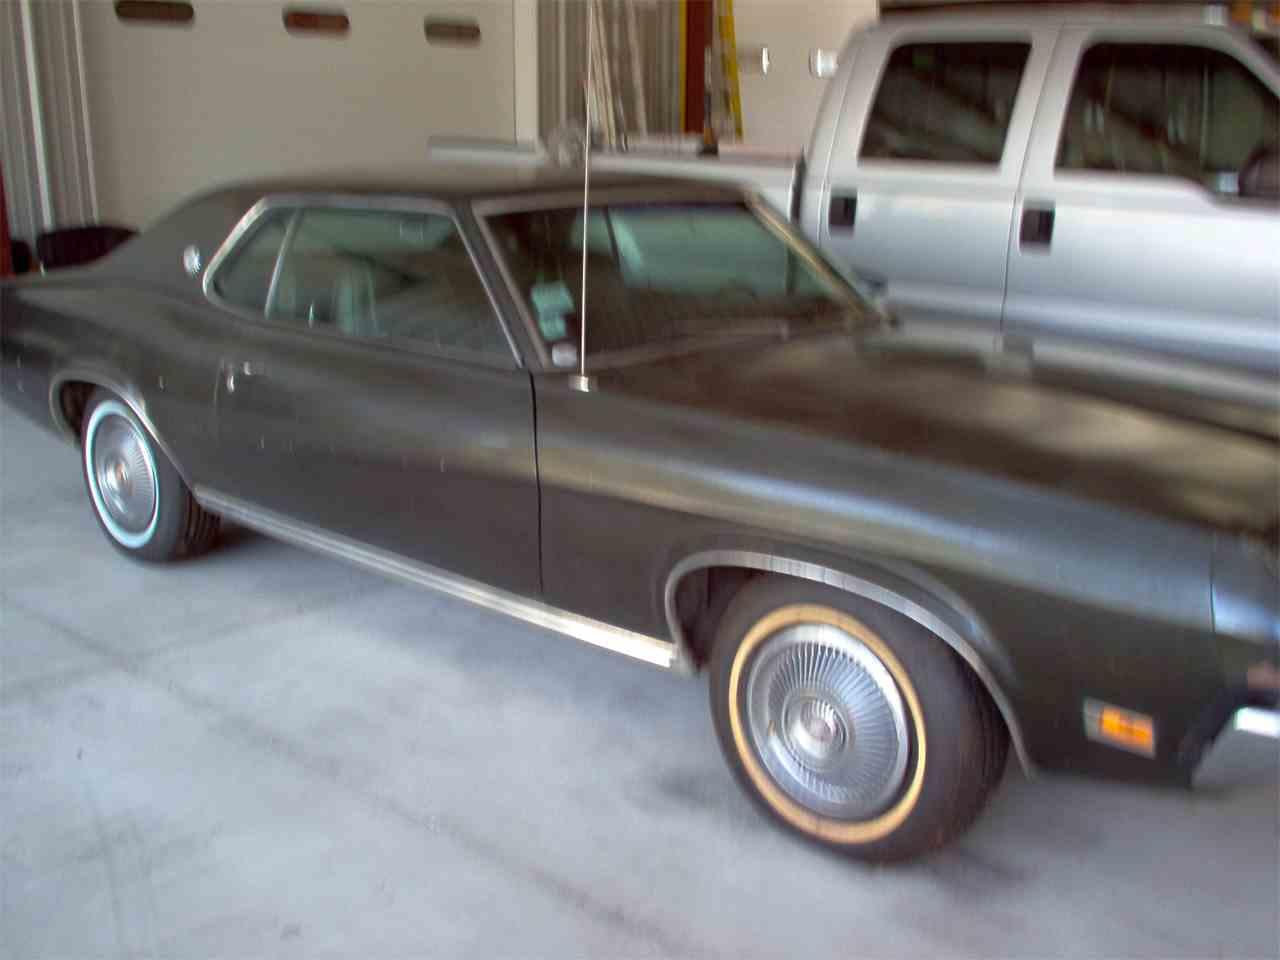 1970 Mercury Cougar XR7 for Sale | ClassicCars.com | CC-1044103